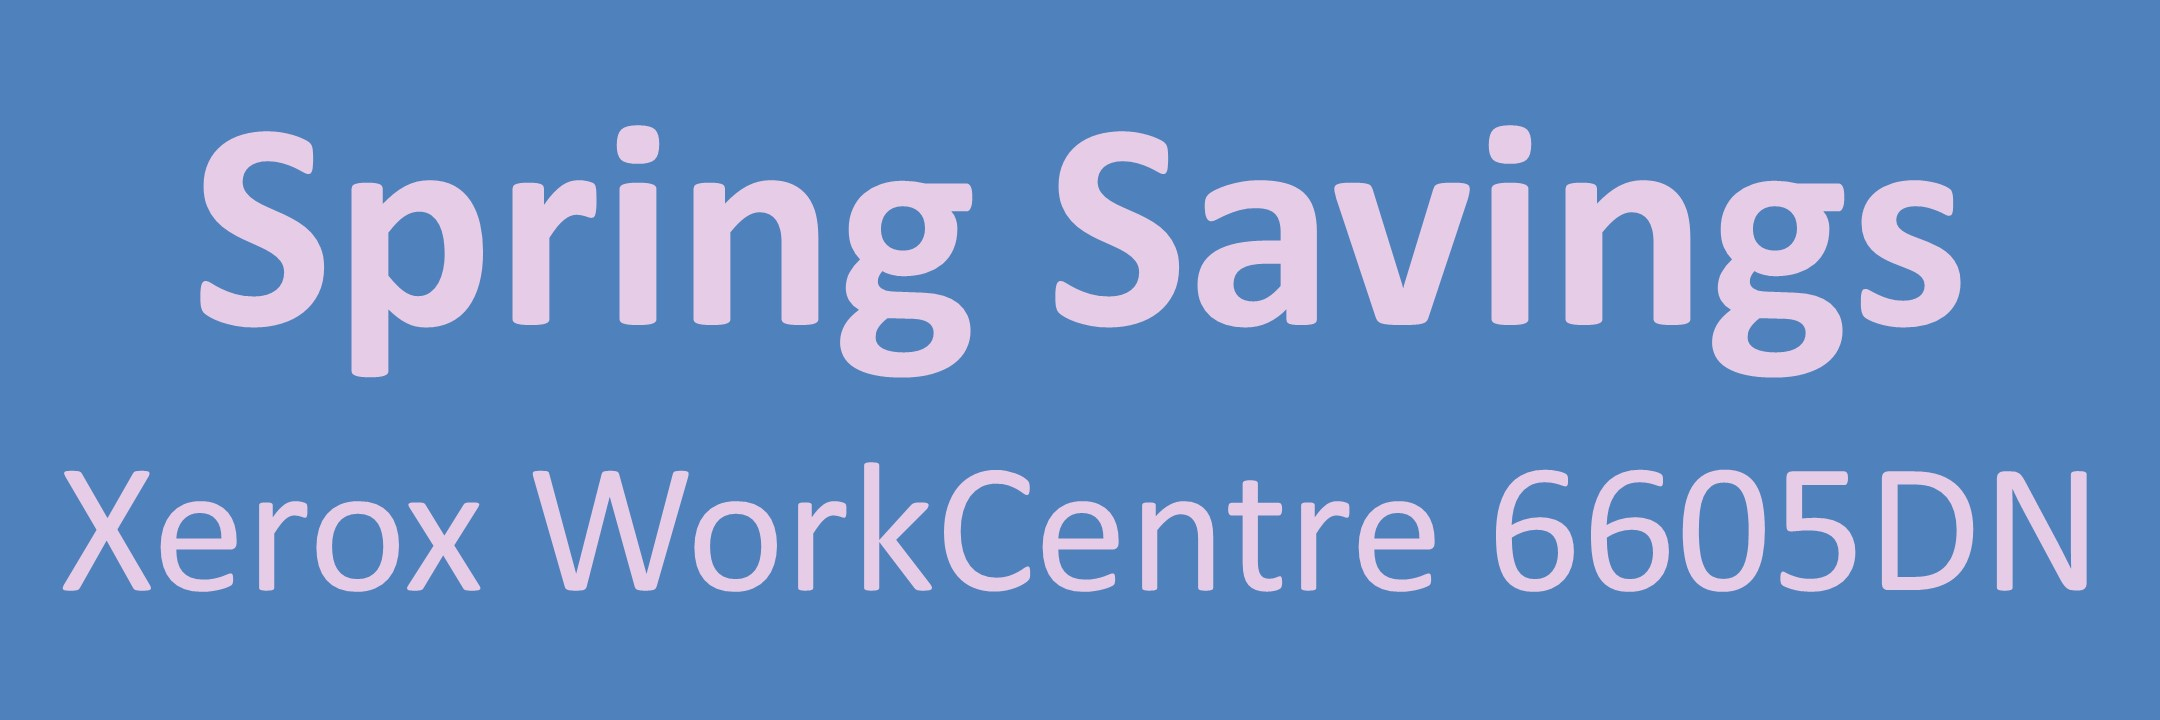 Xerox WorkCentre 6605 Spring Savings